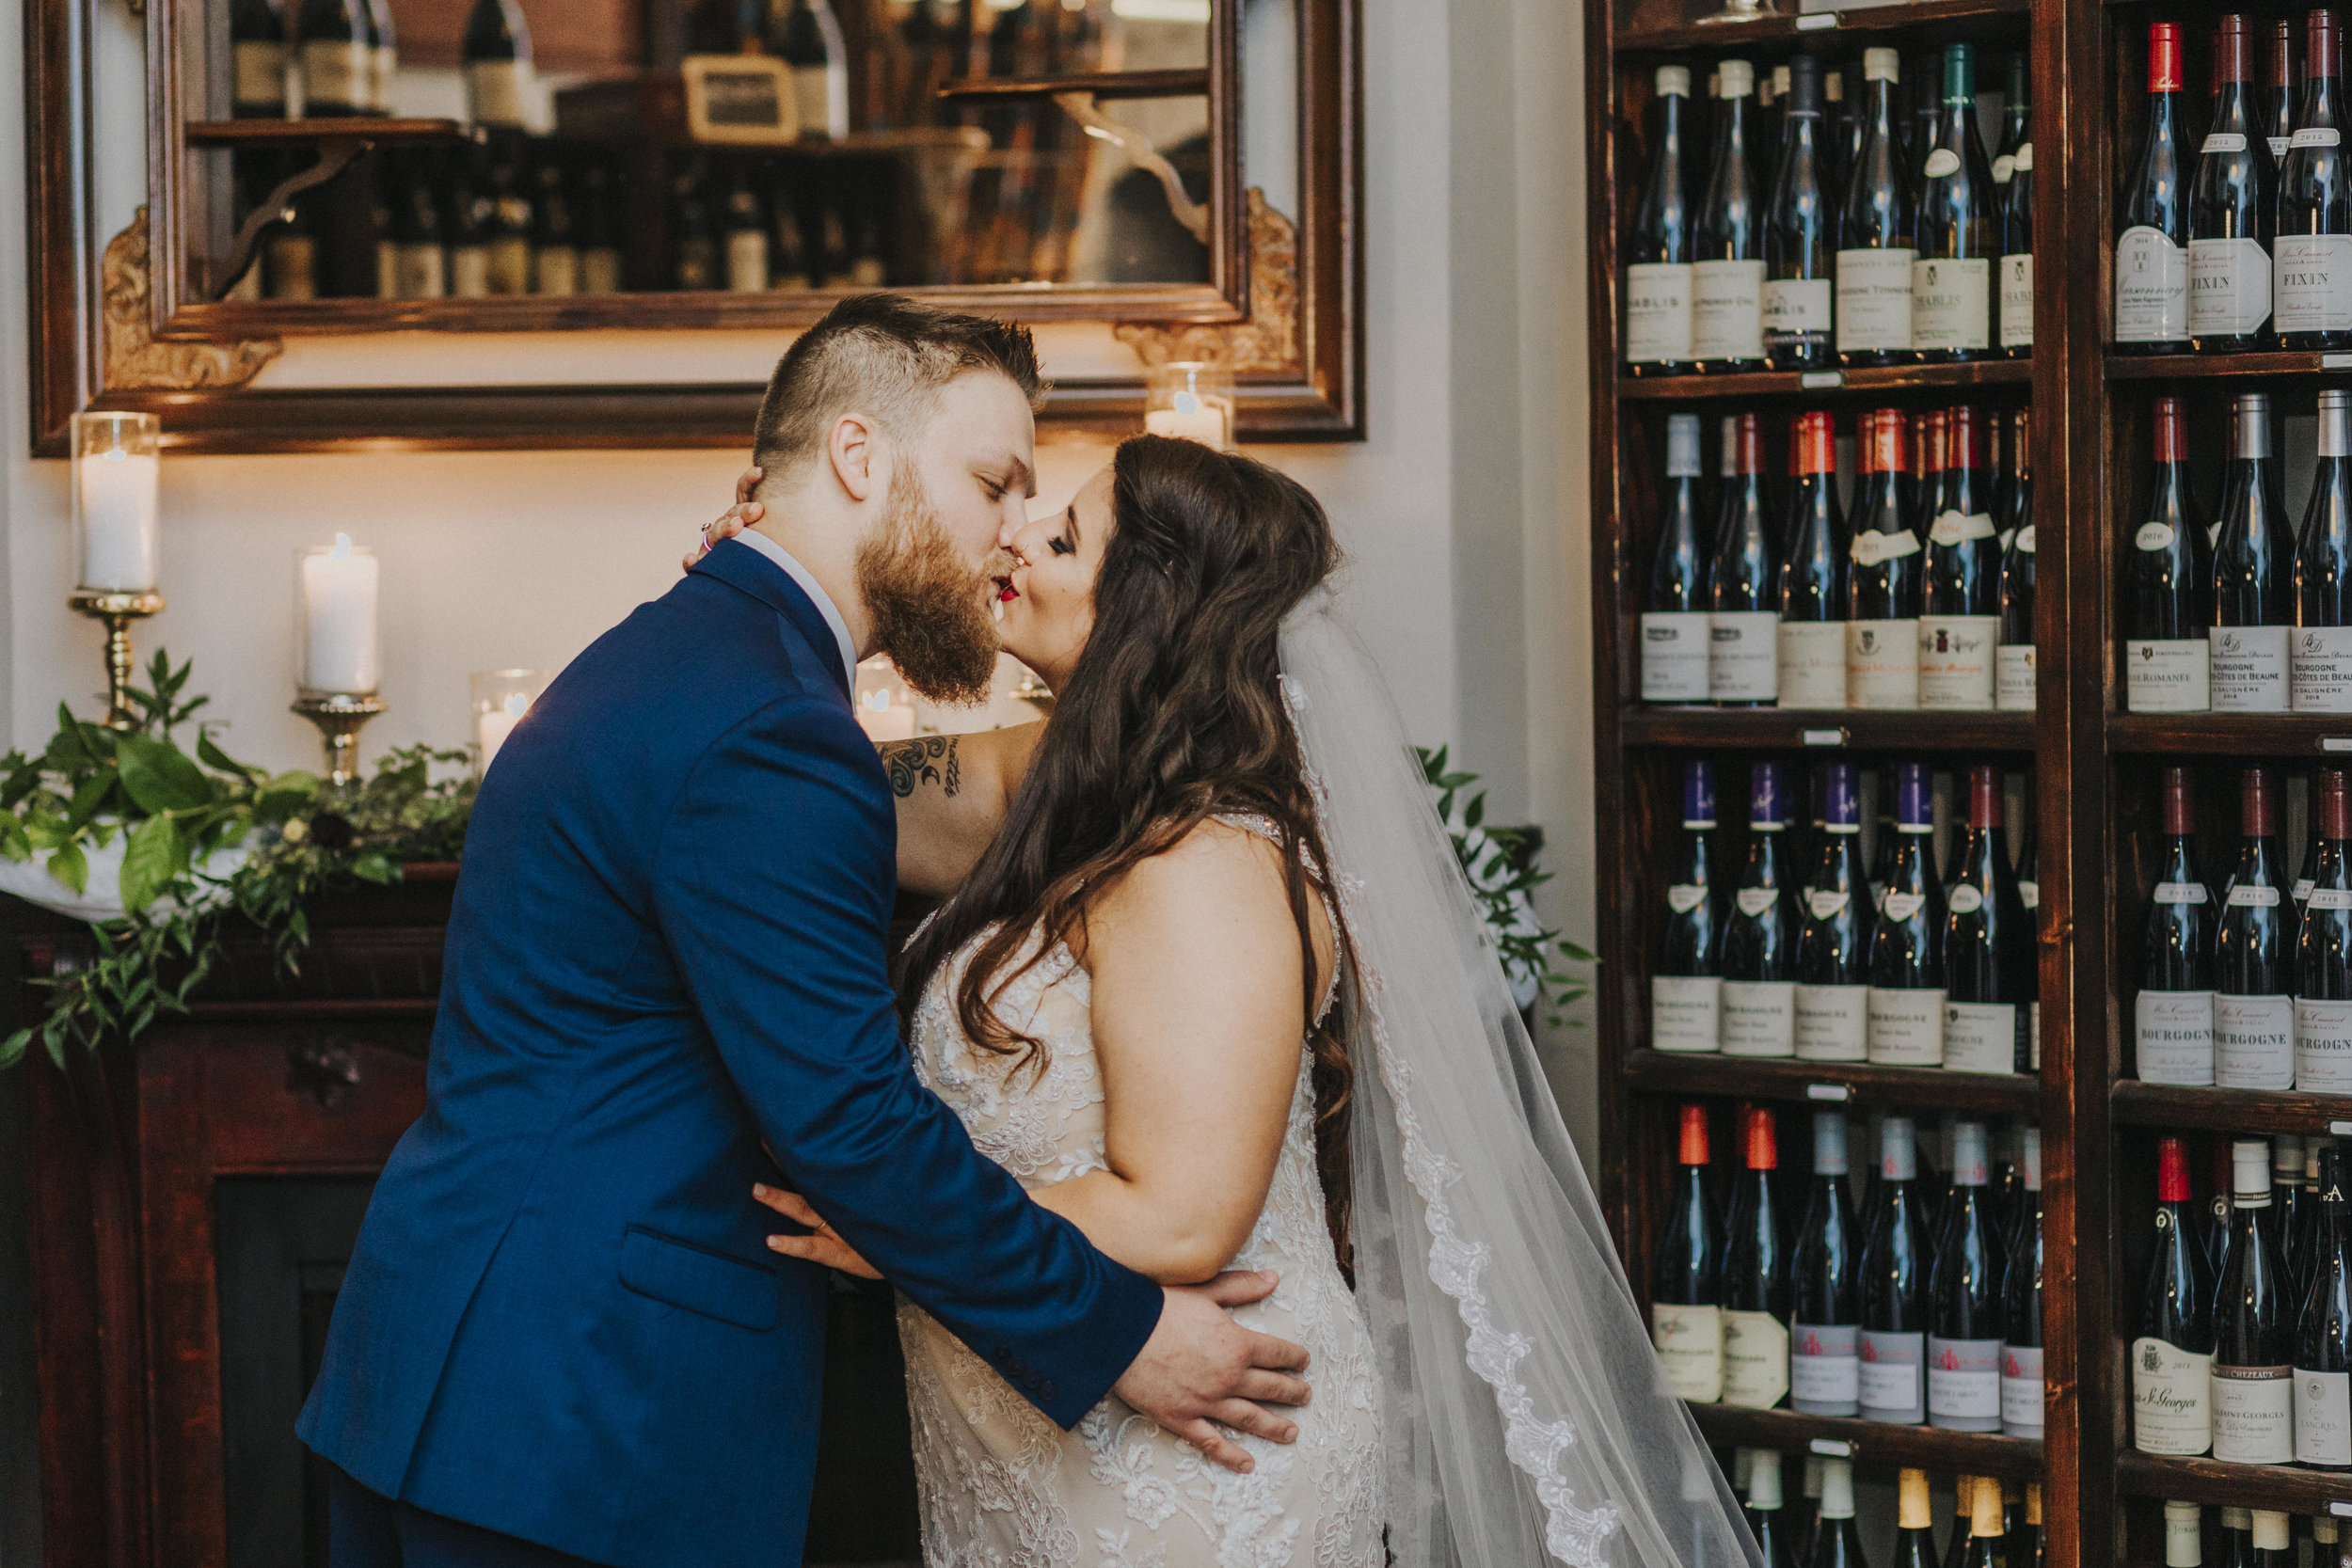 82 tiny-luxe-weddings-custom-elopement-summer-omaha-old-market.jpg